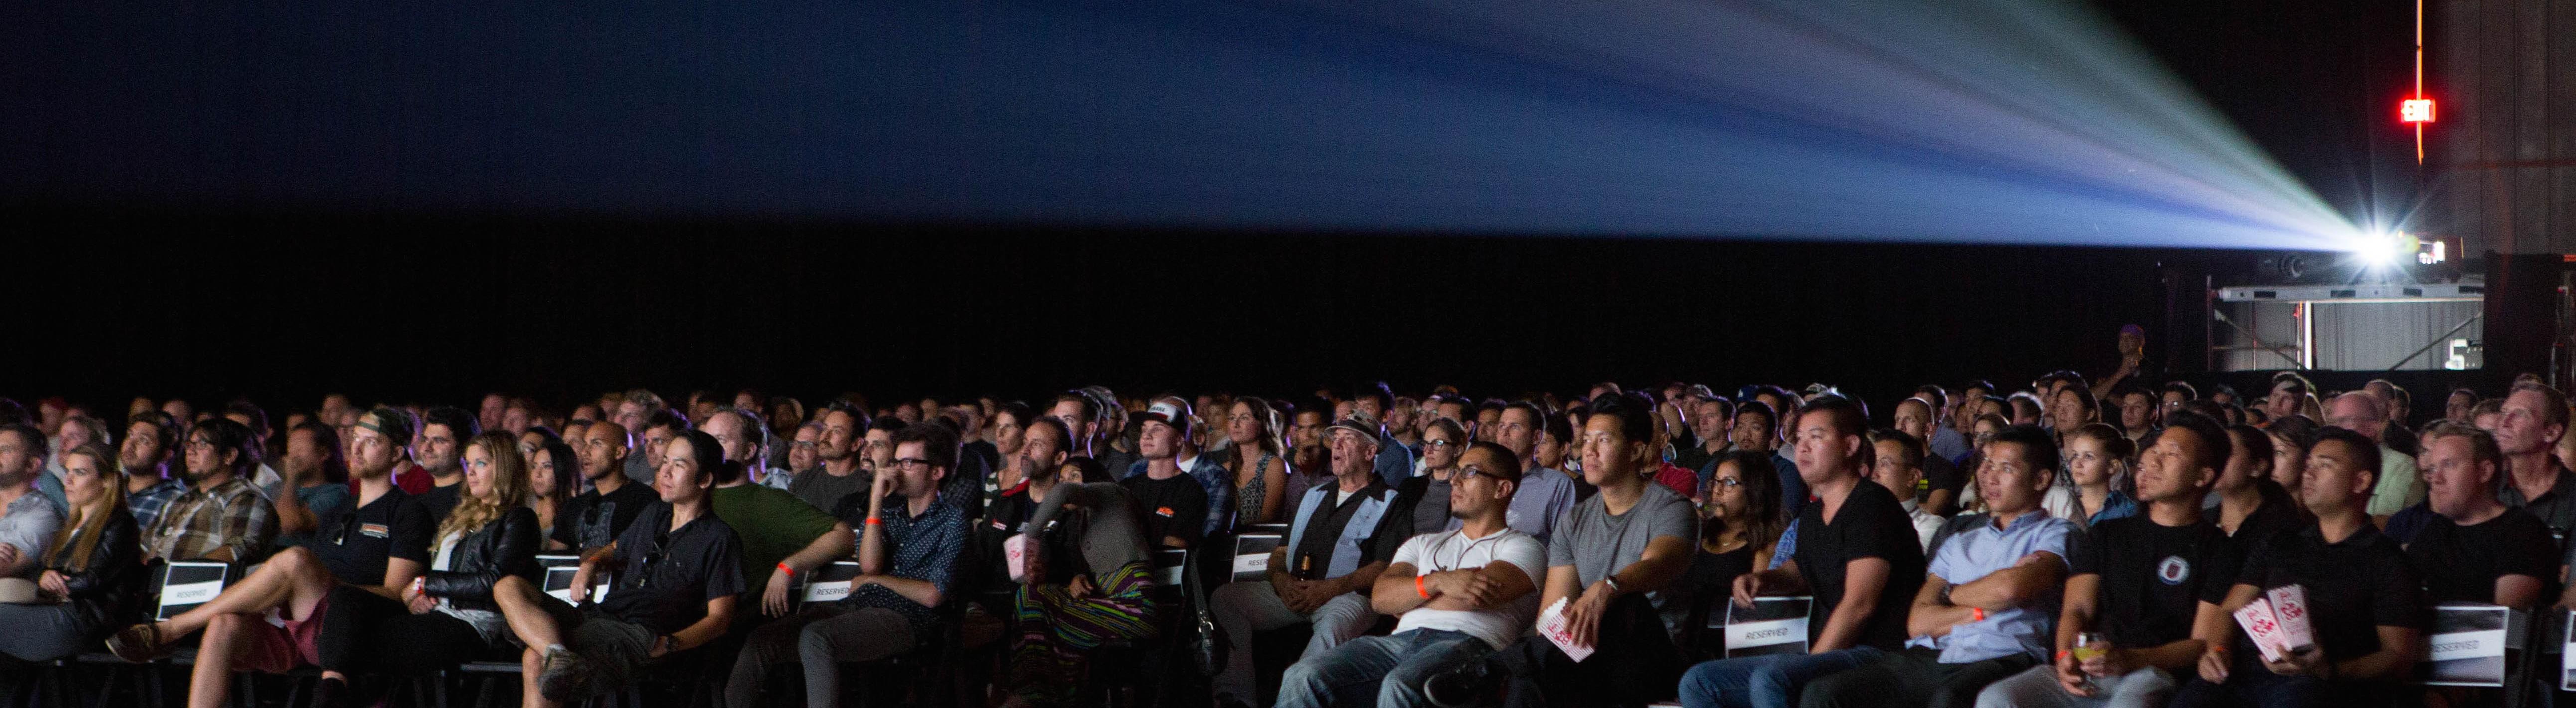 Film festival audience